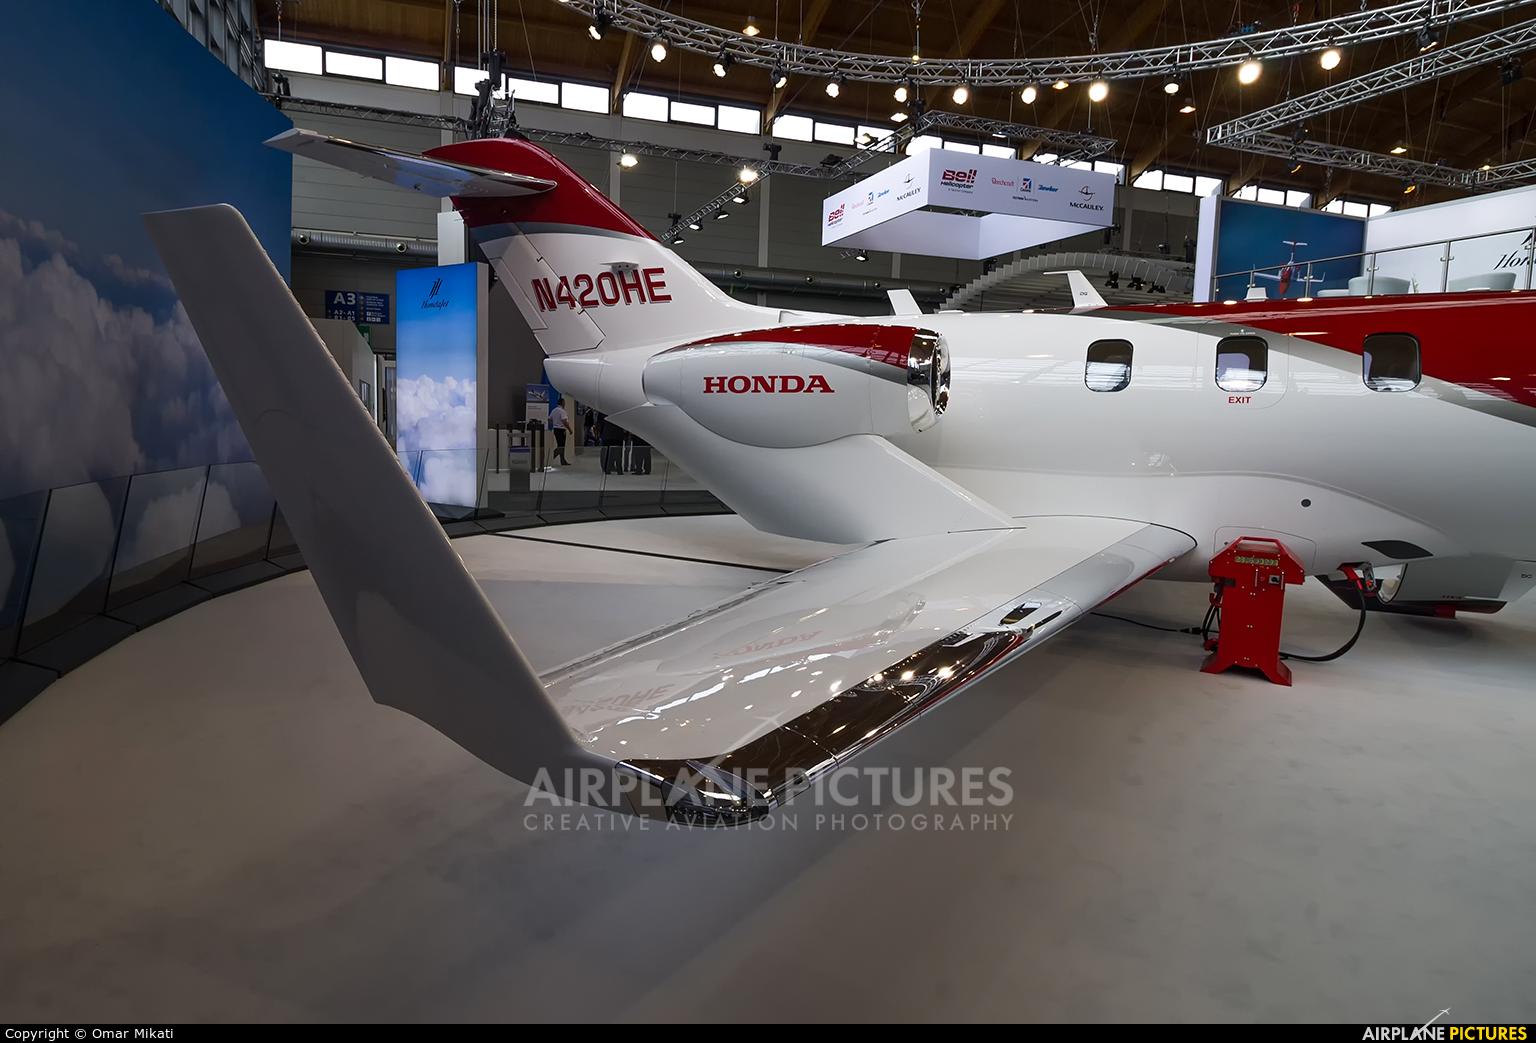 Honda Aerospace N420HE aircraft at Friedrichshafen